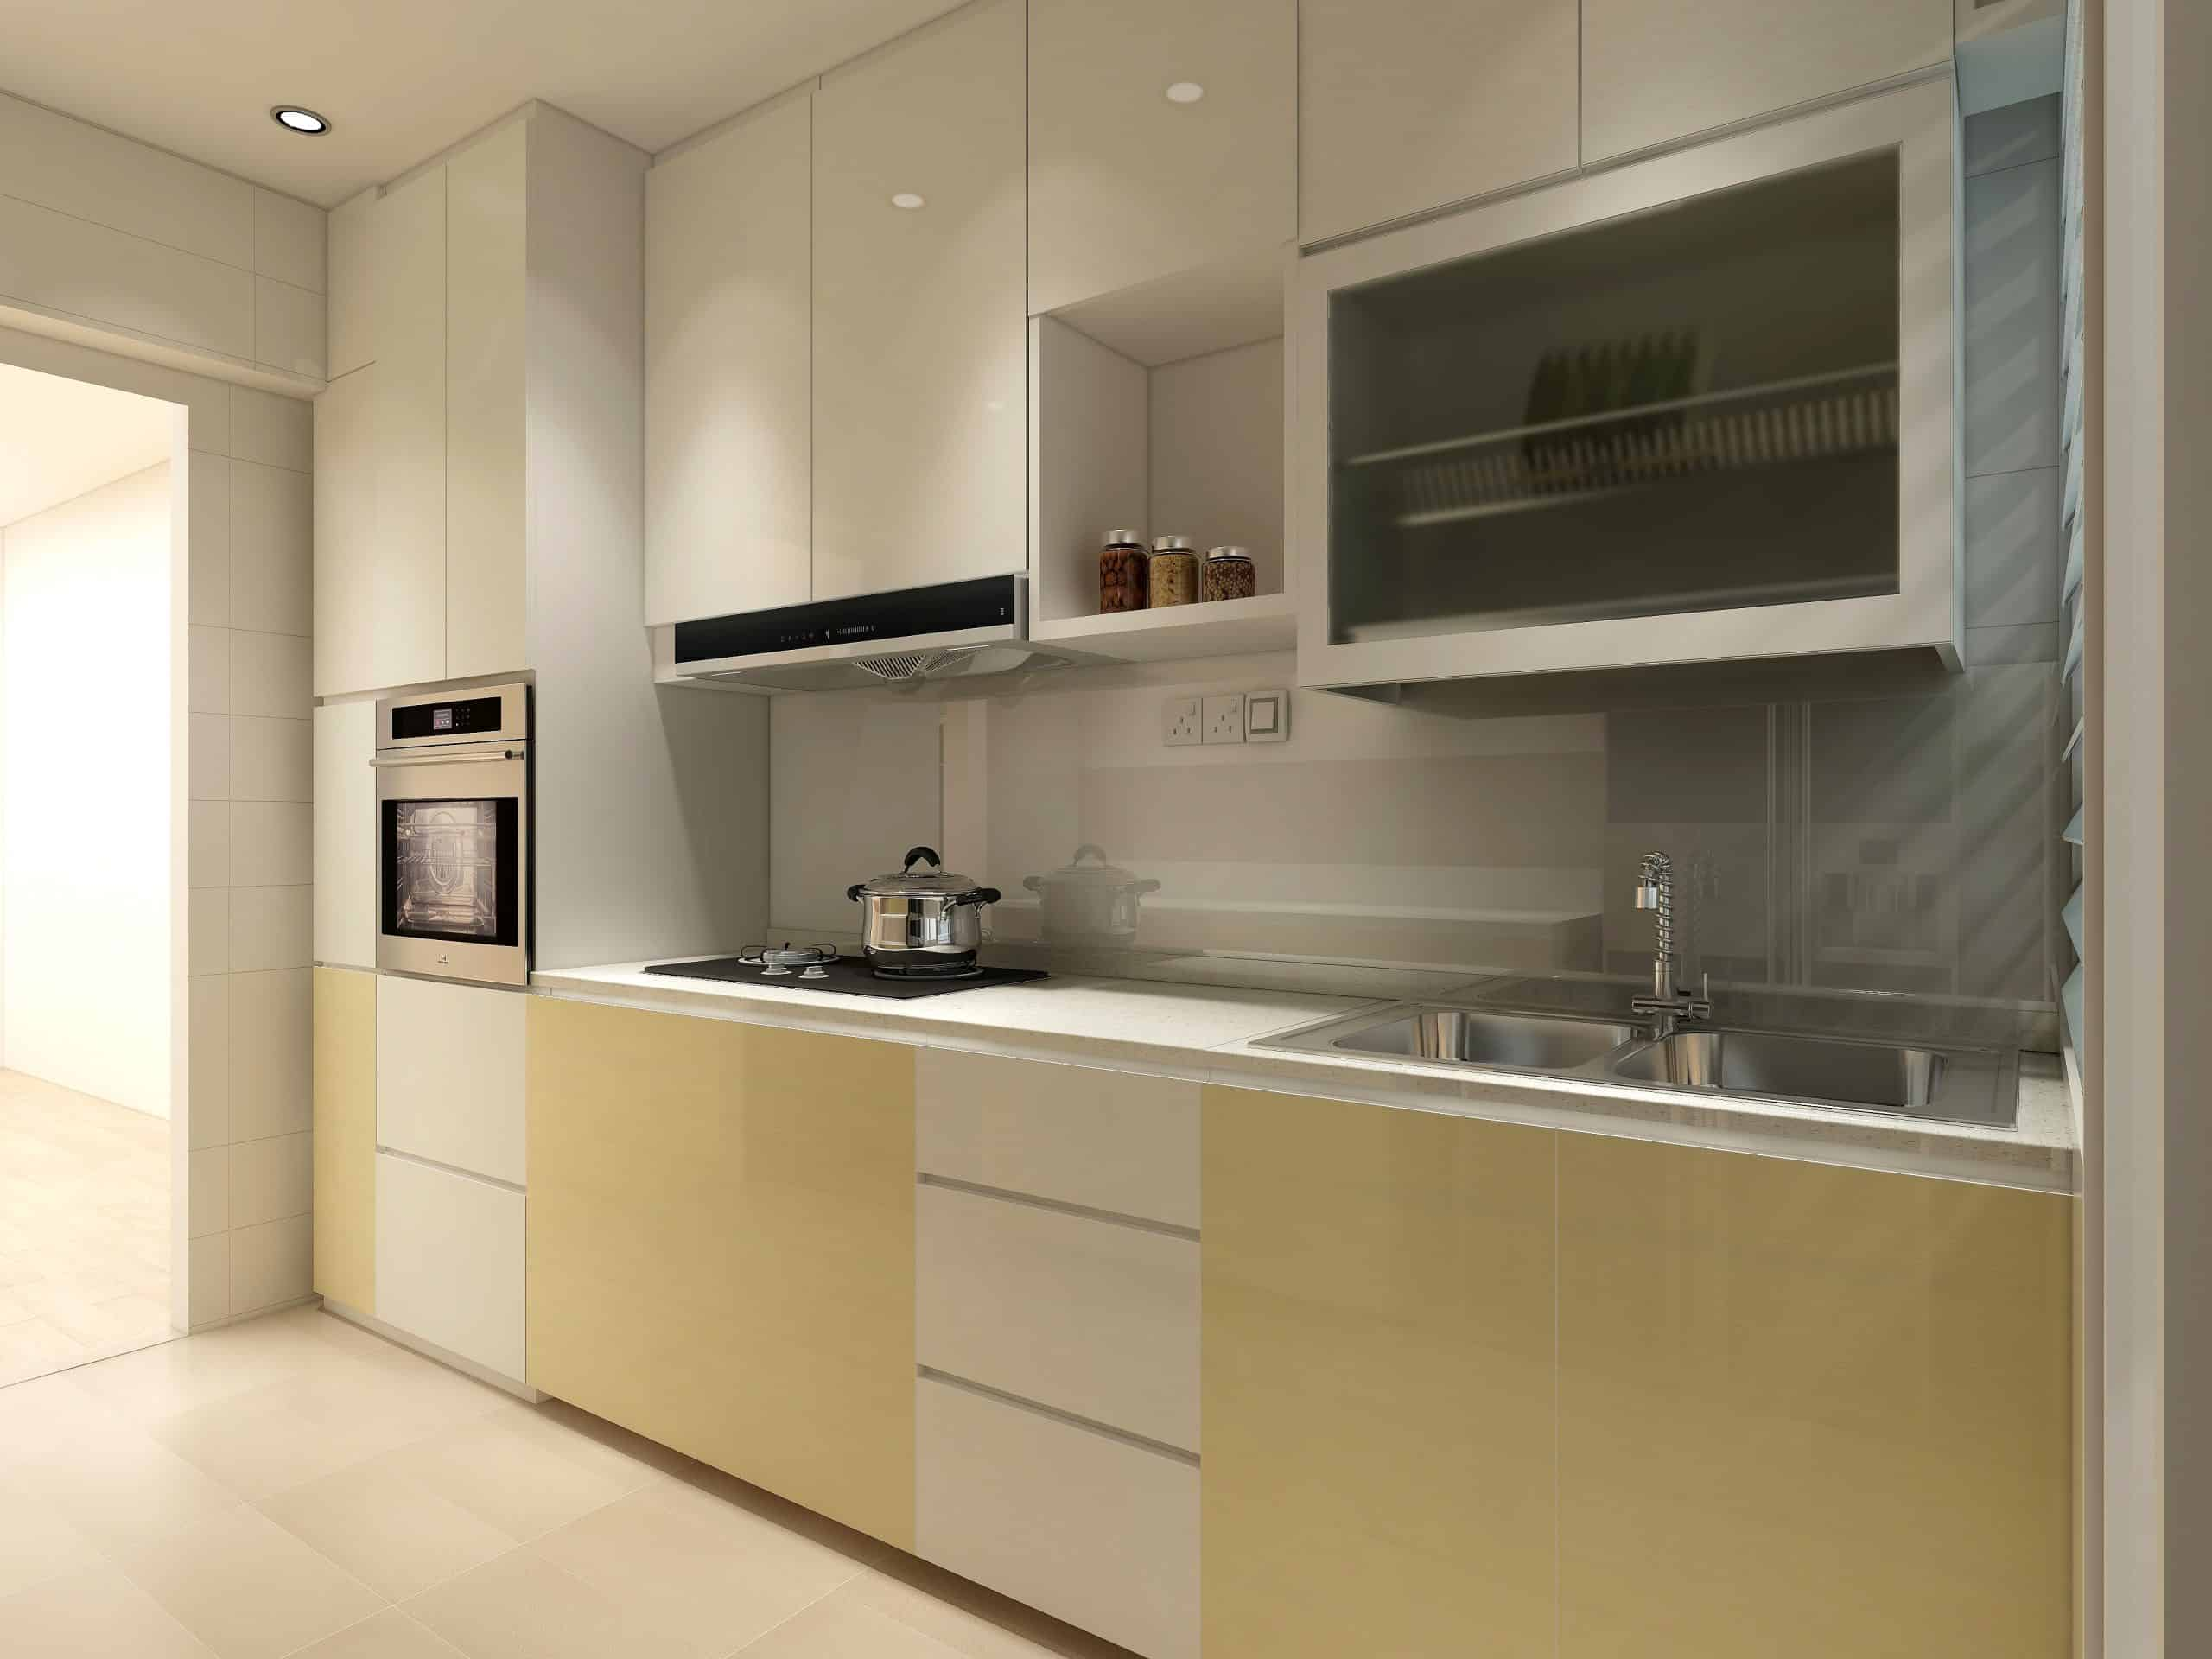 Aluminium Kitchen Cabinet A Star Furnishing